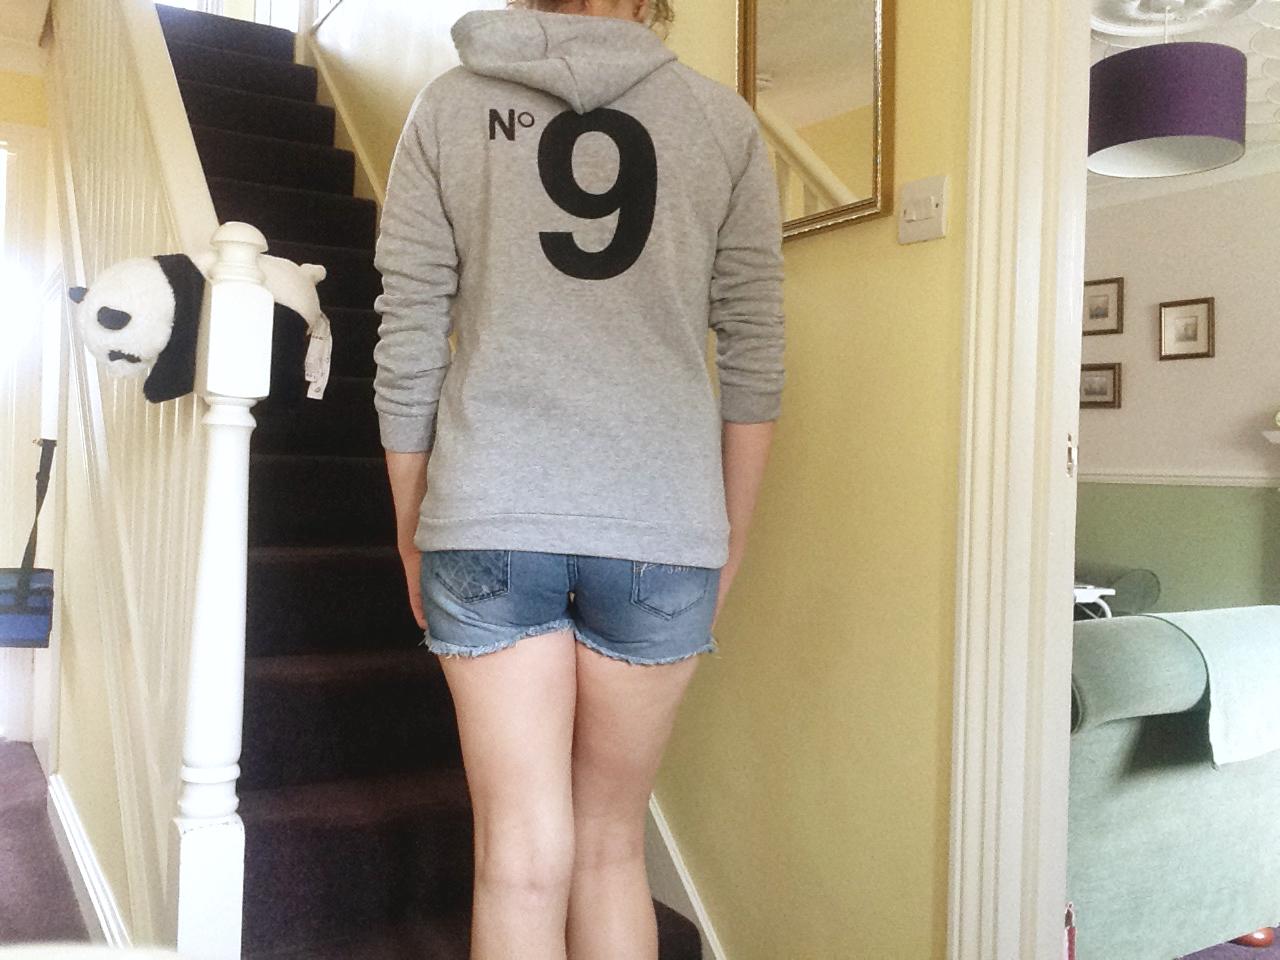 Korea Women Casual Hoodie Sweatshirt DressLink Coco Chanel Hoodie Sweatshirt